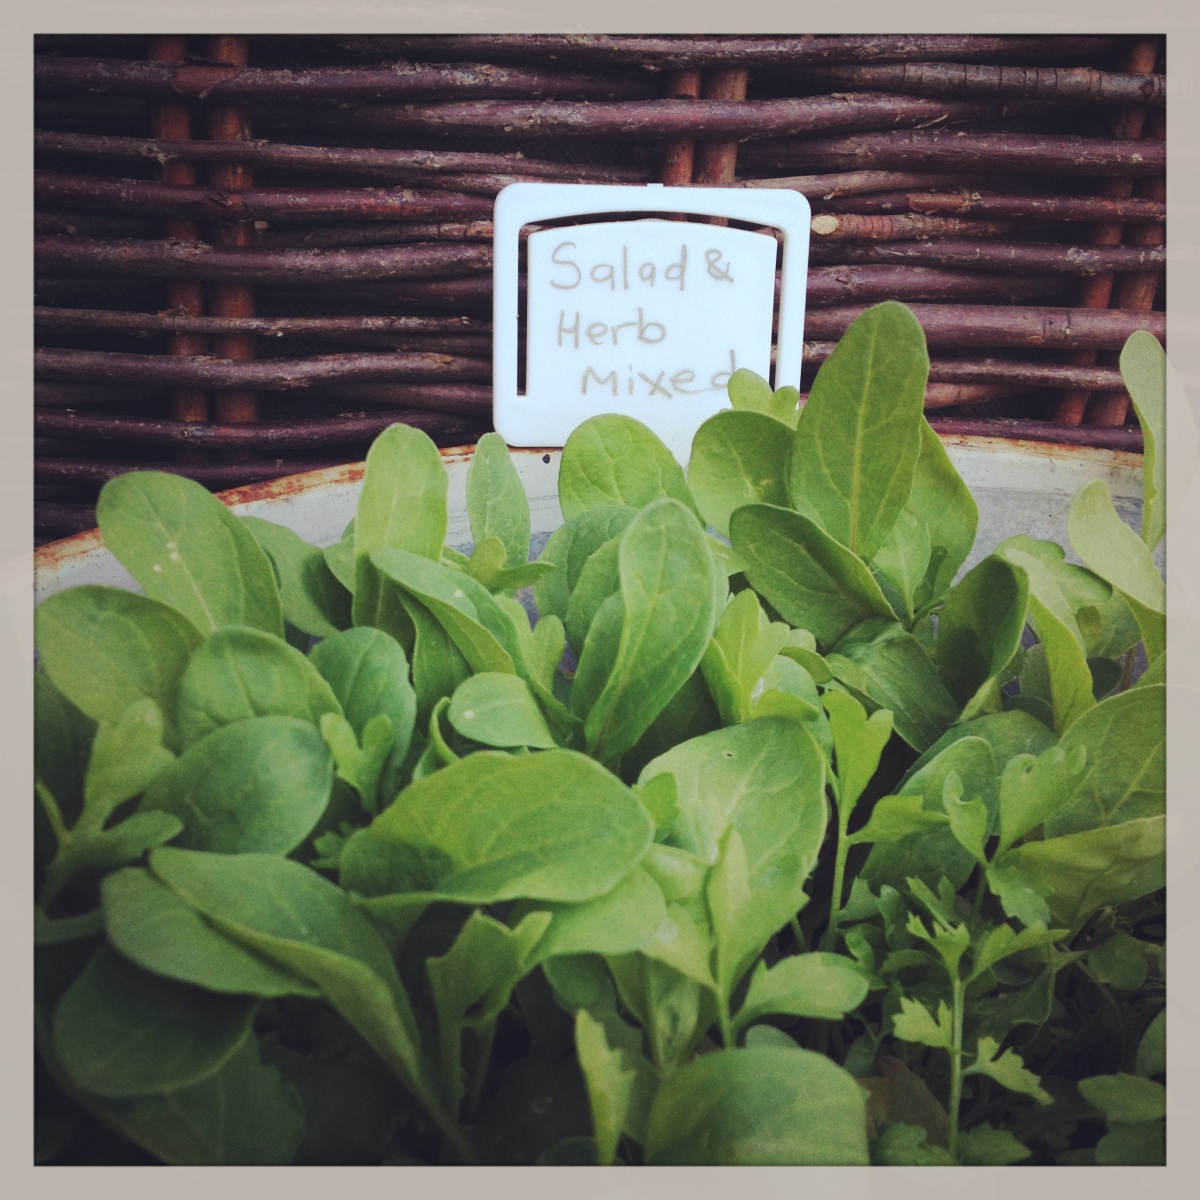 Long were the Salad Days: A Summer SaladChallenge